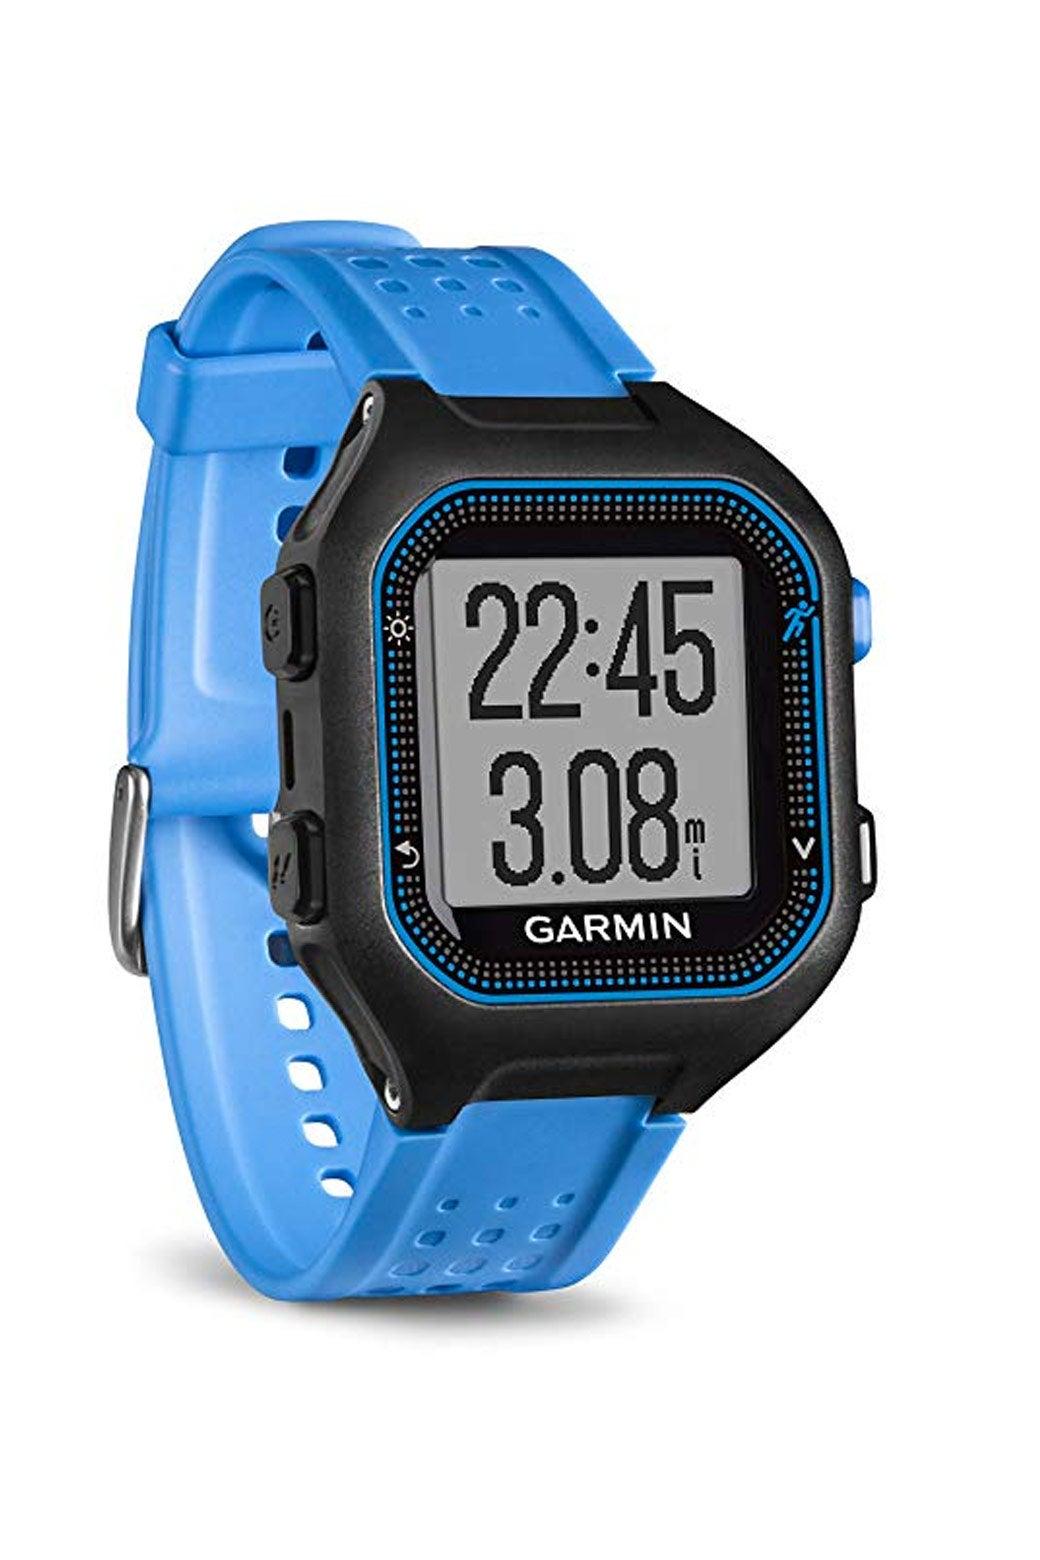 A Garmin watch.